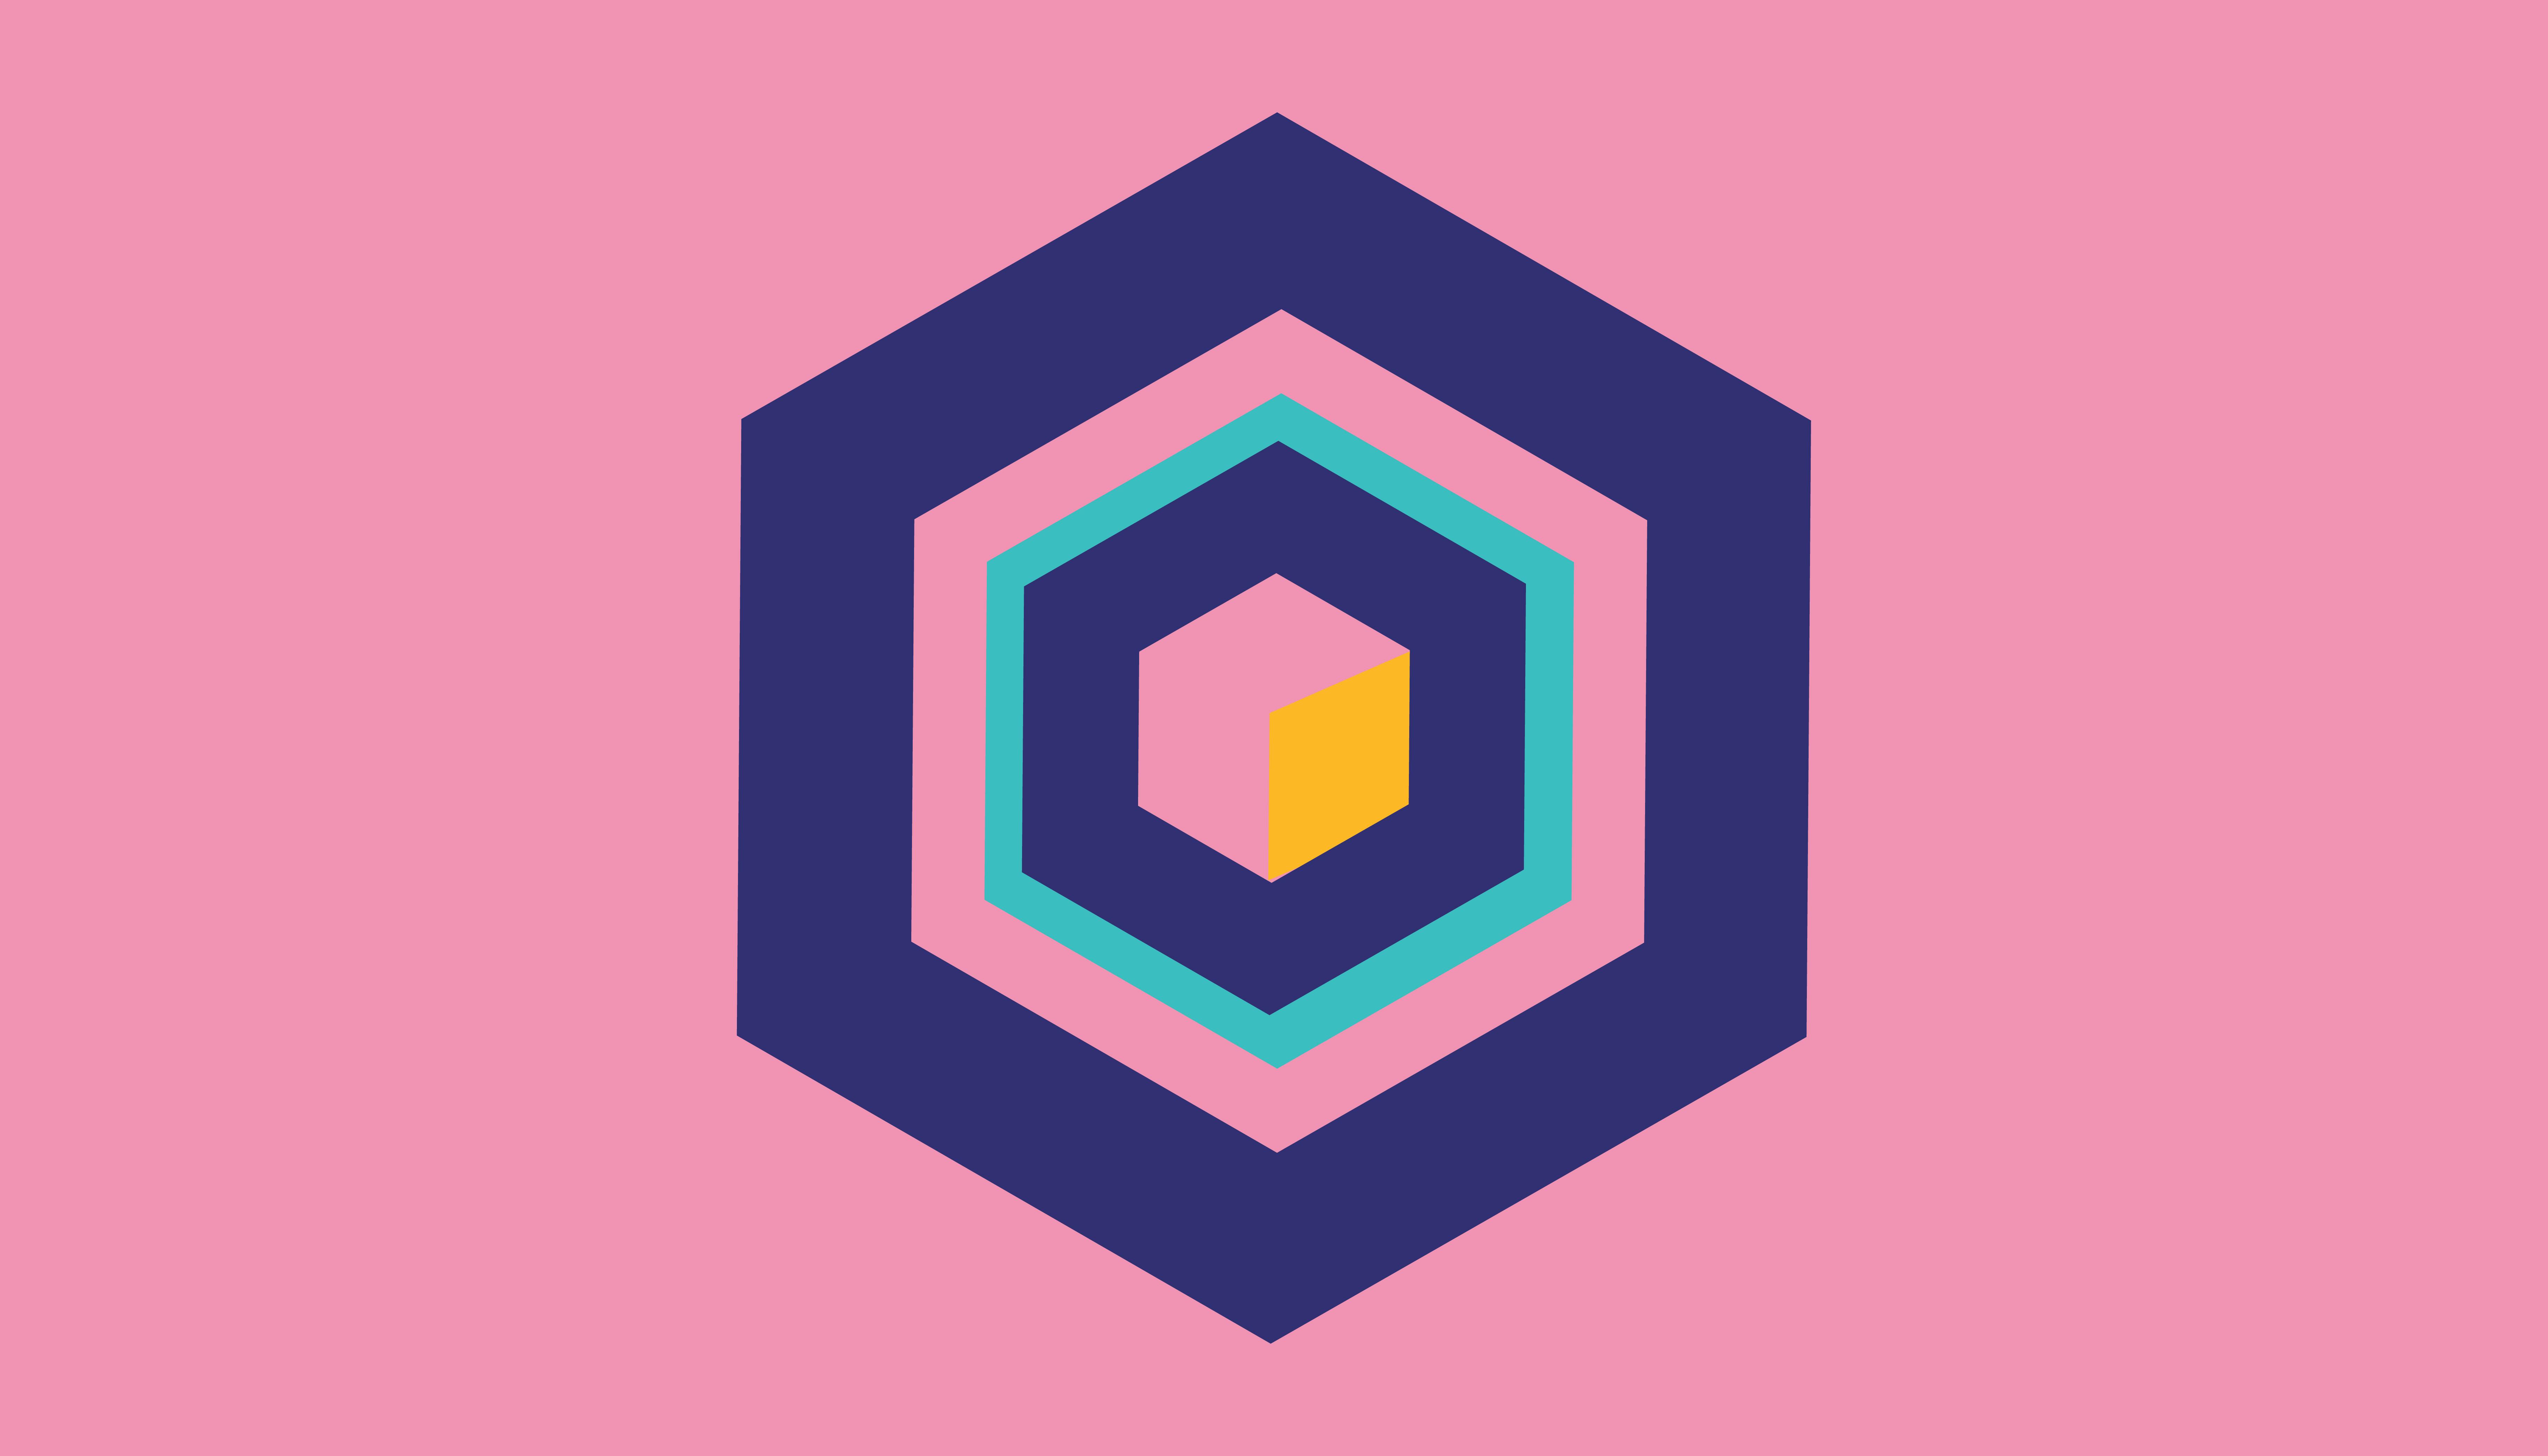 Geometrics_3